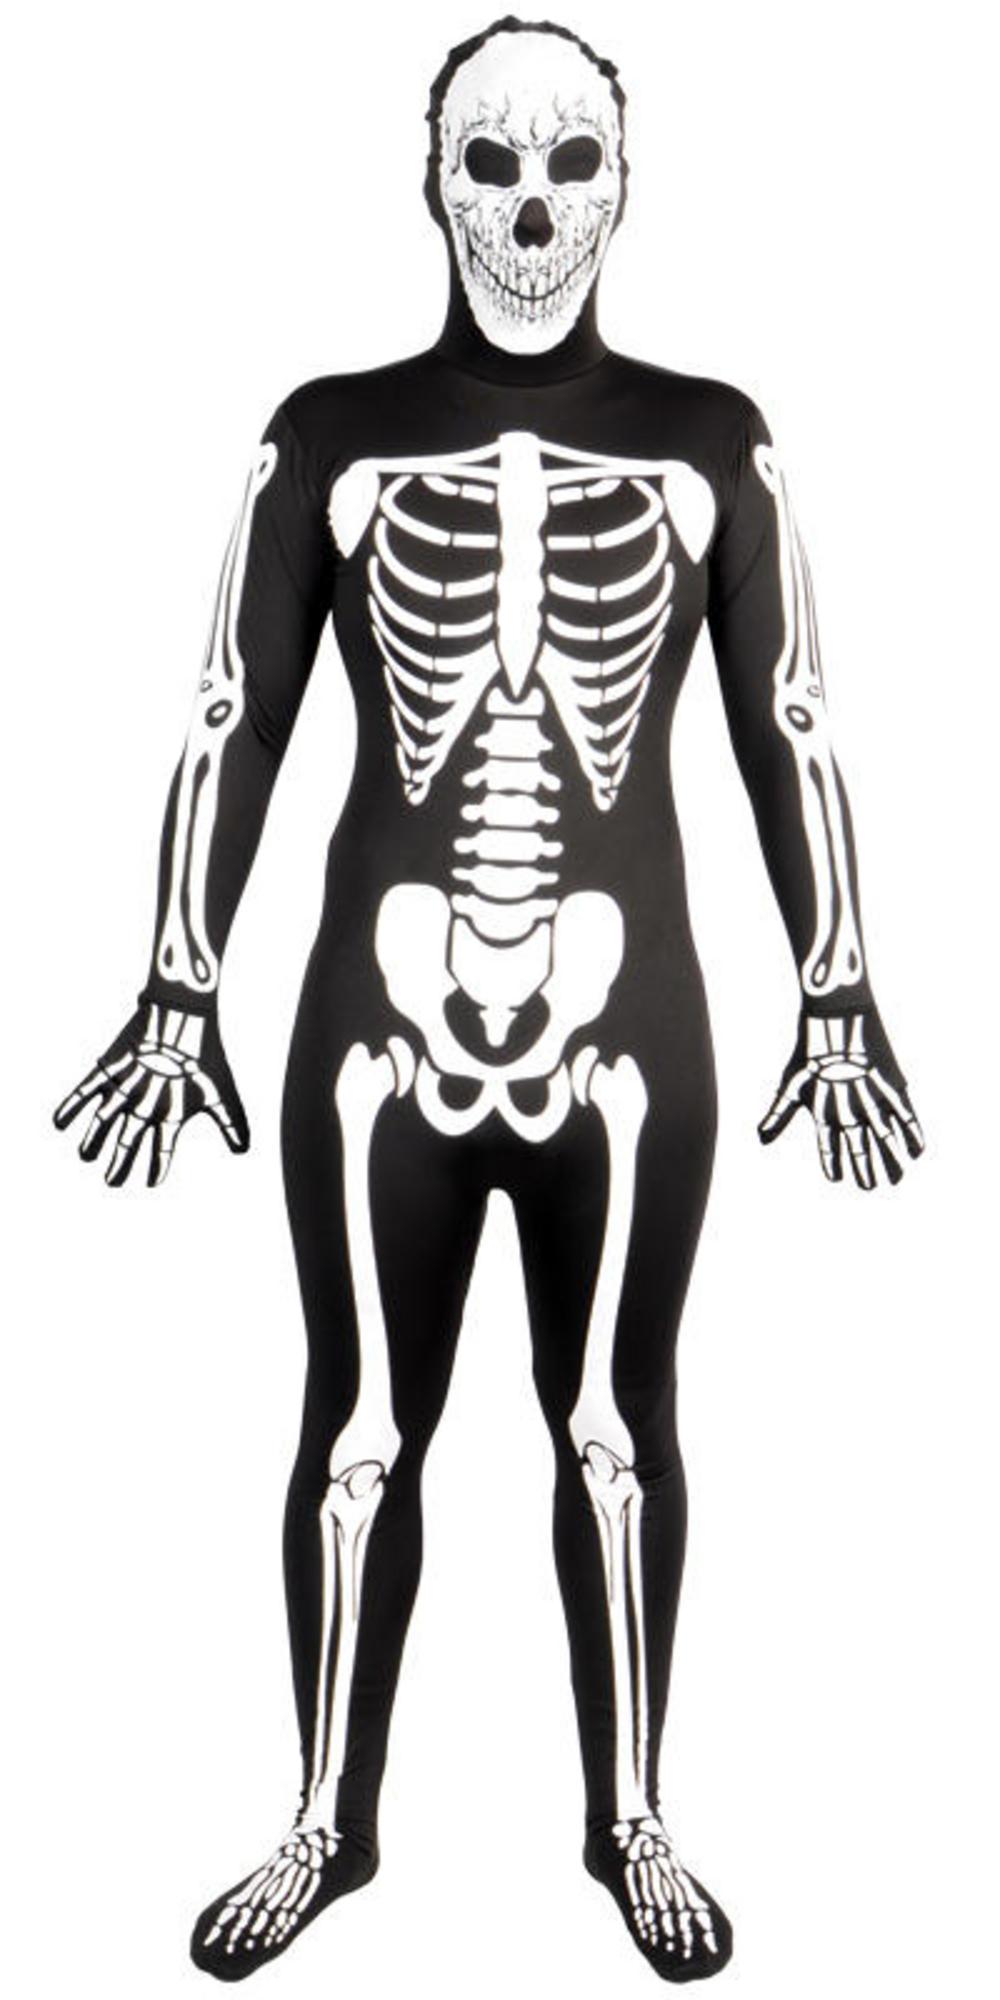 Glow In The Dark Skeleton Skinsuit Costume Skeleton Costumes